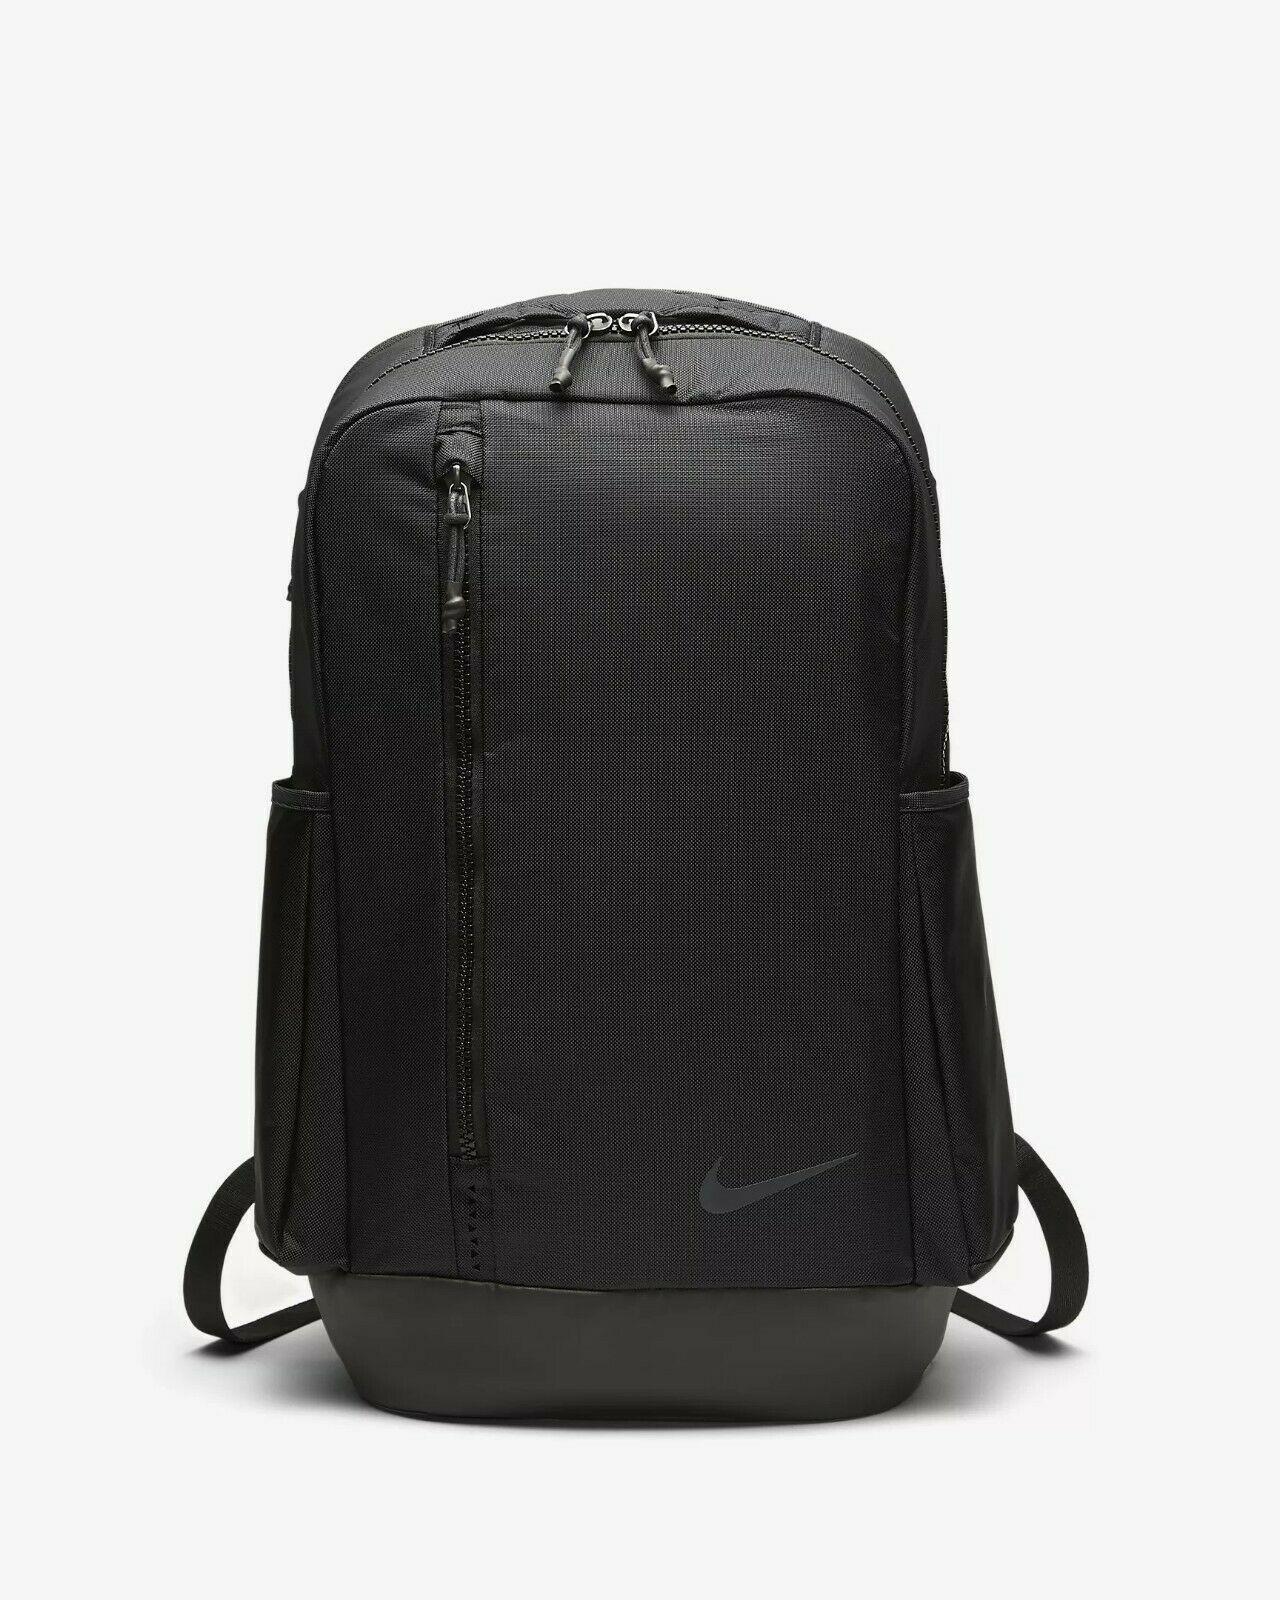 Nike Vapor Power 2.0 Training Backpack, BA5539 010 Black/Black/Black image 5